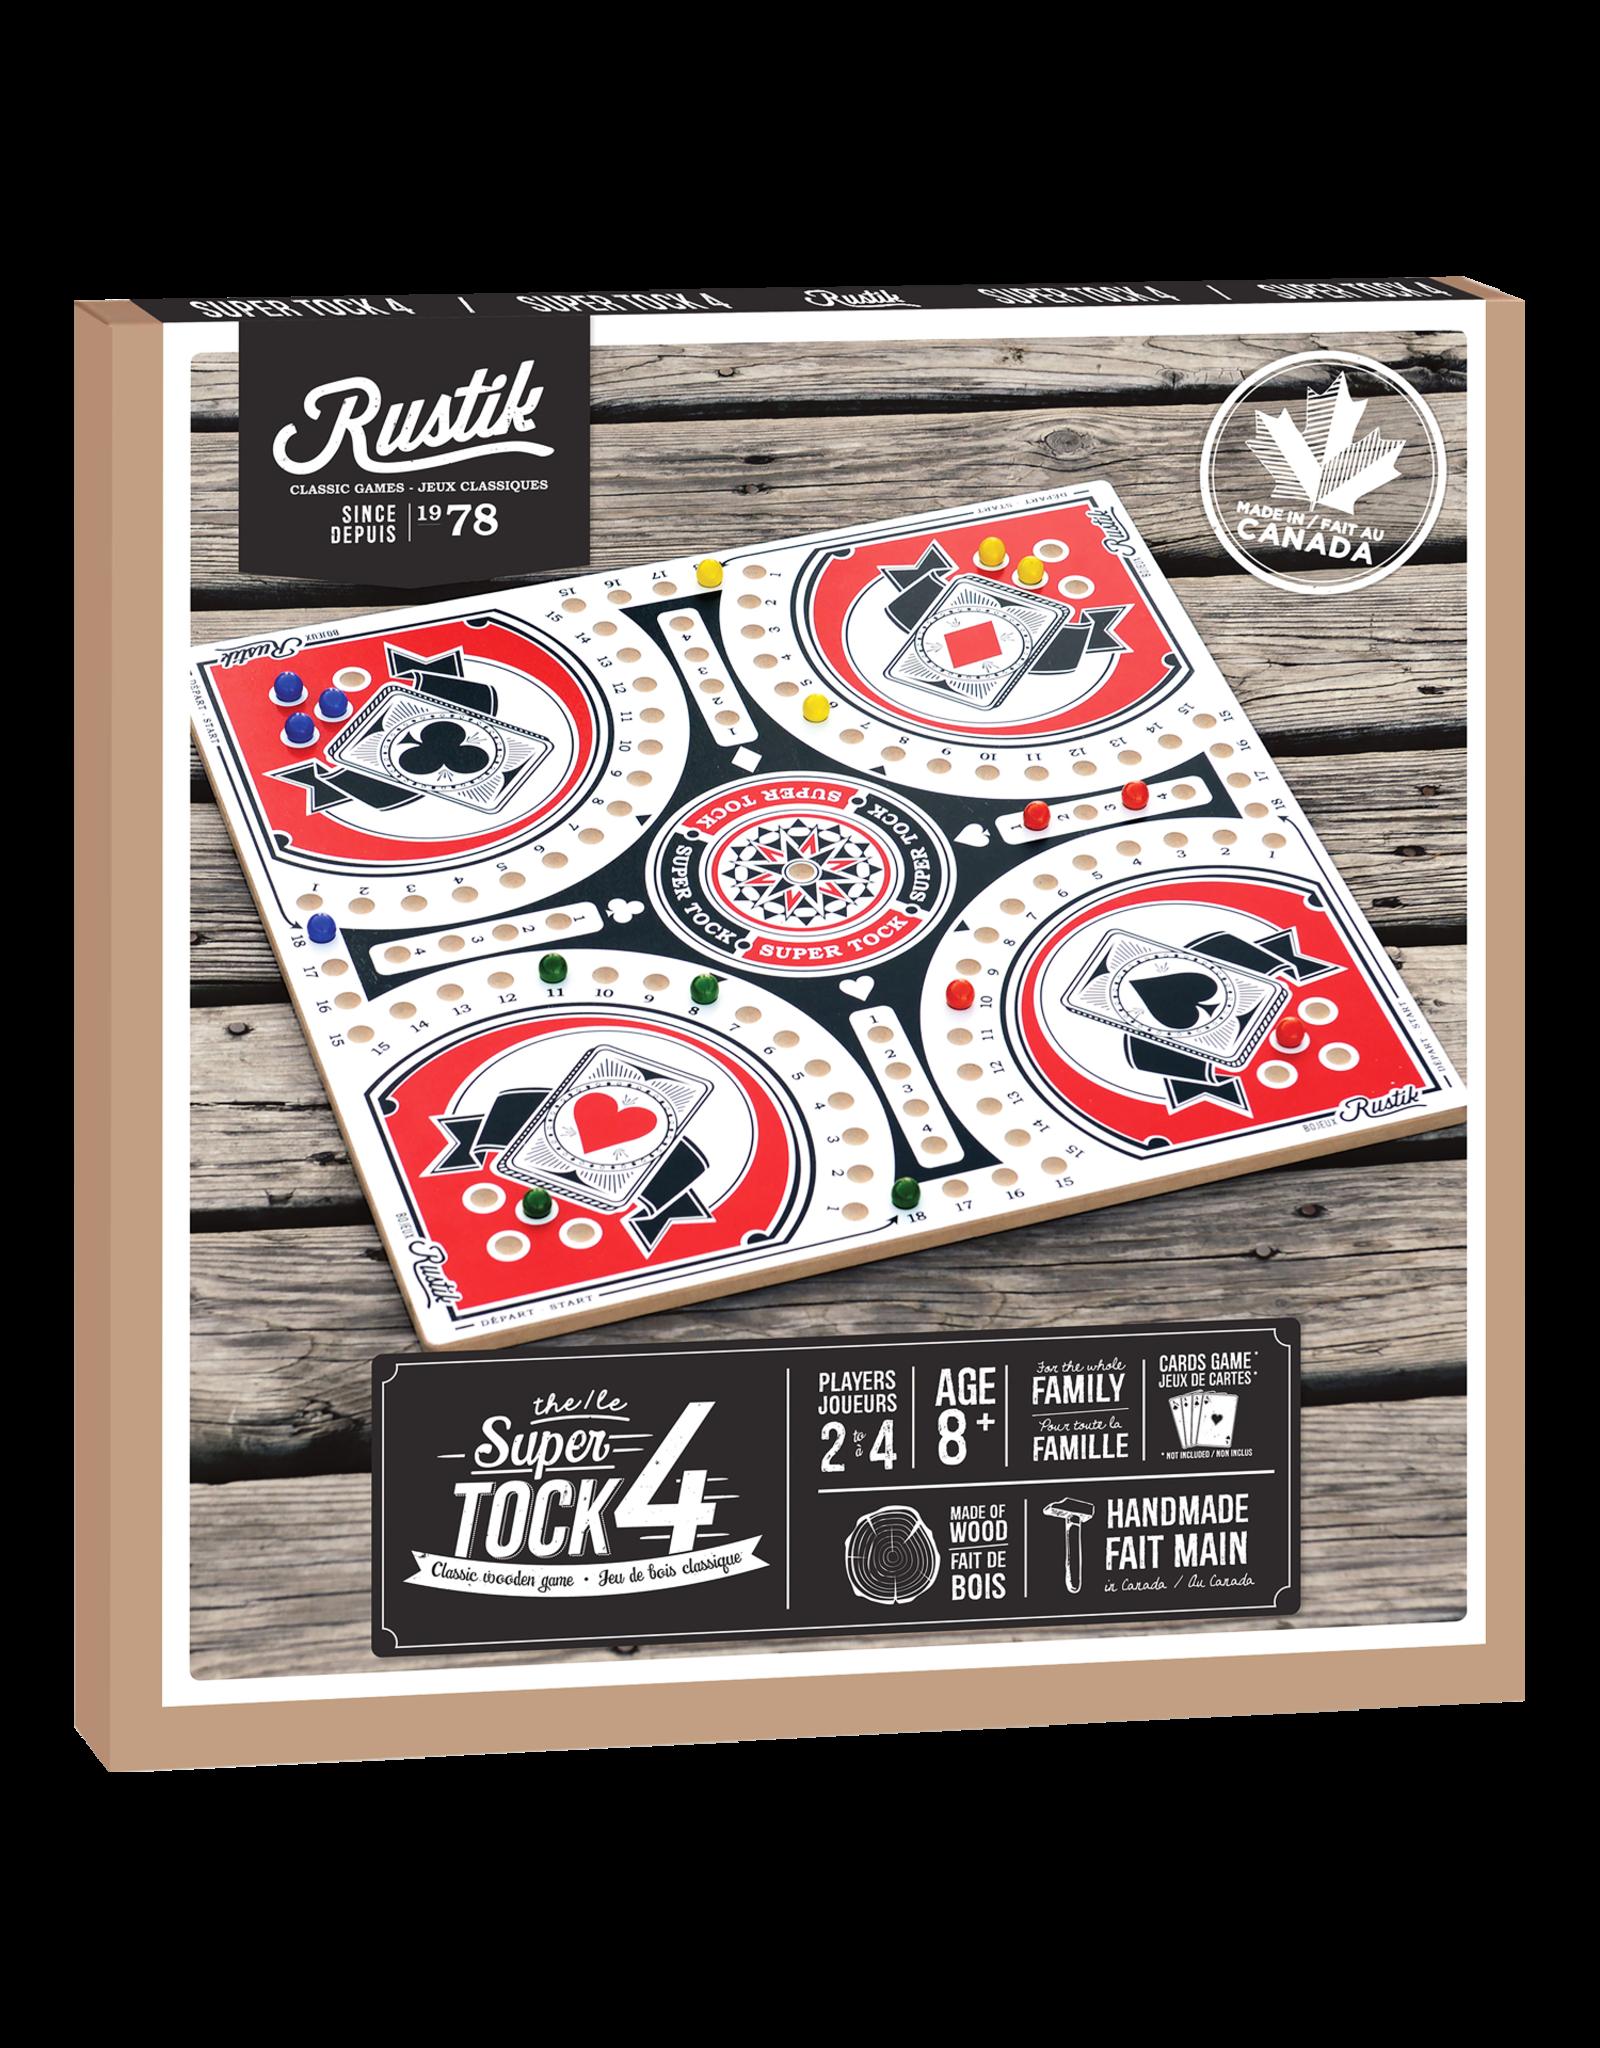 Rustik Super Tock Game 4 Player